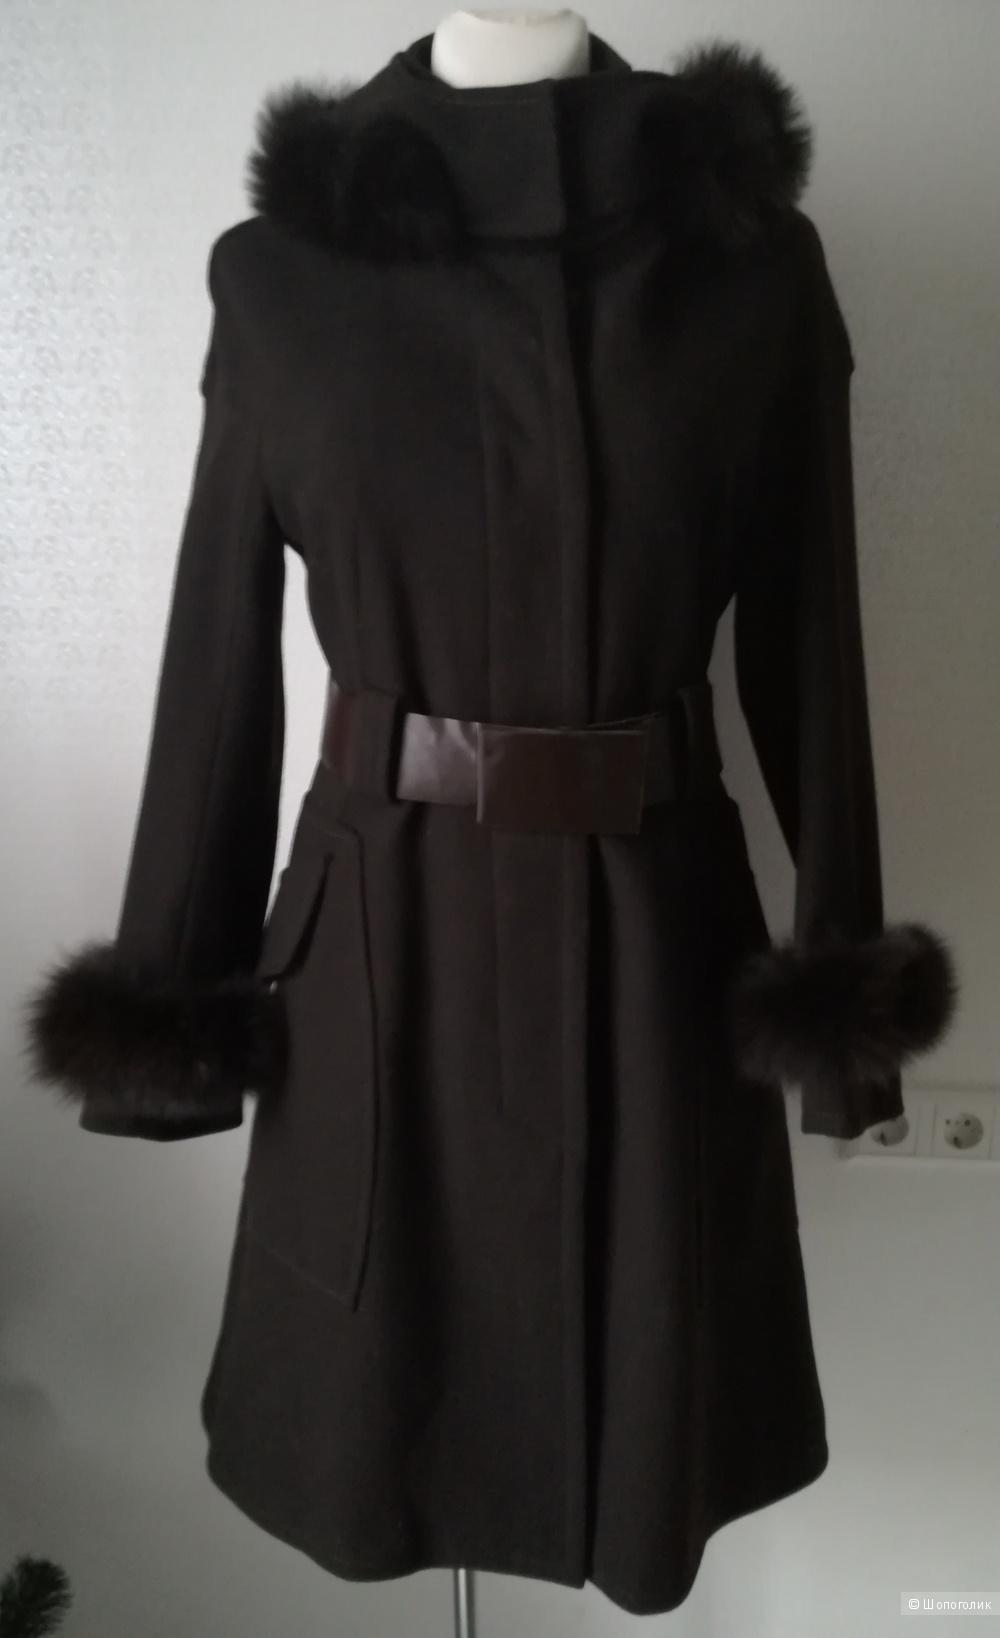 Пальто Sportmax Max Mara, размер М